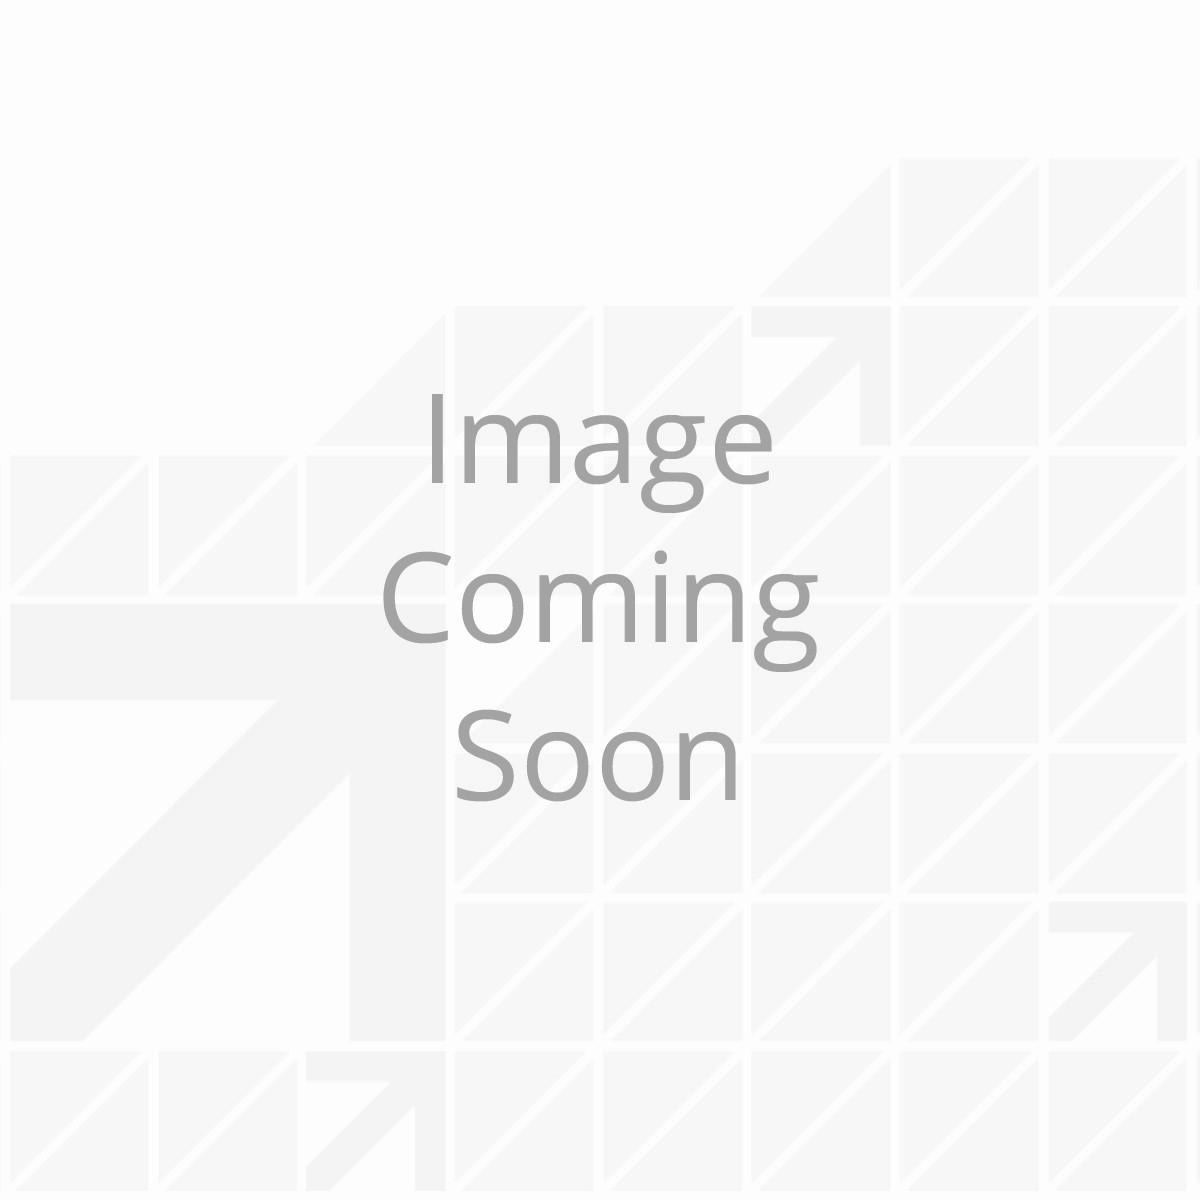 421484_GC-TT-Touch-Pad_001